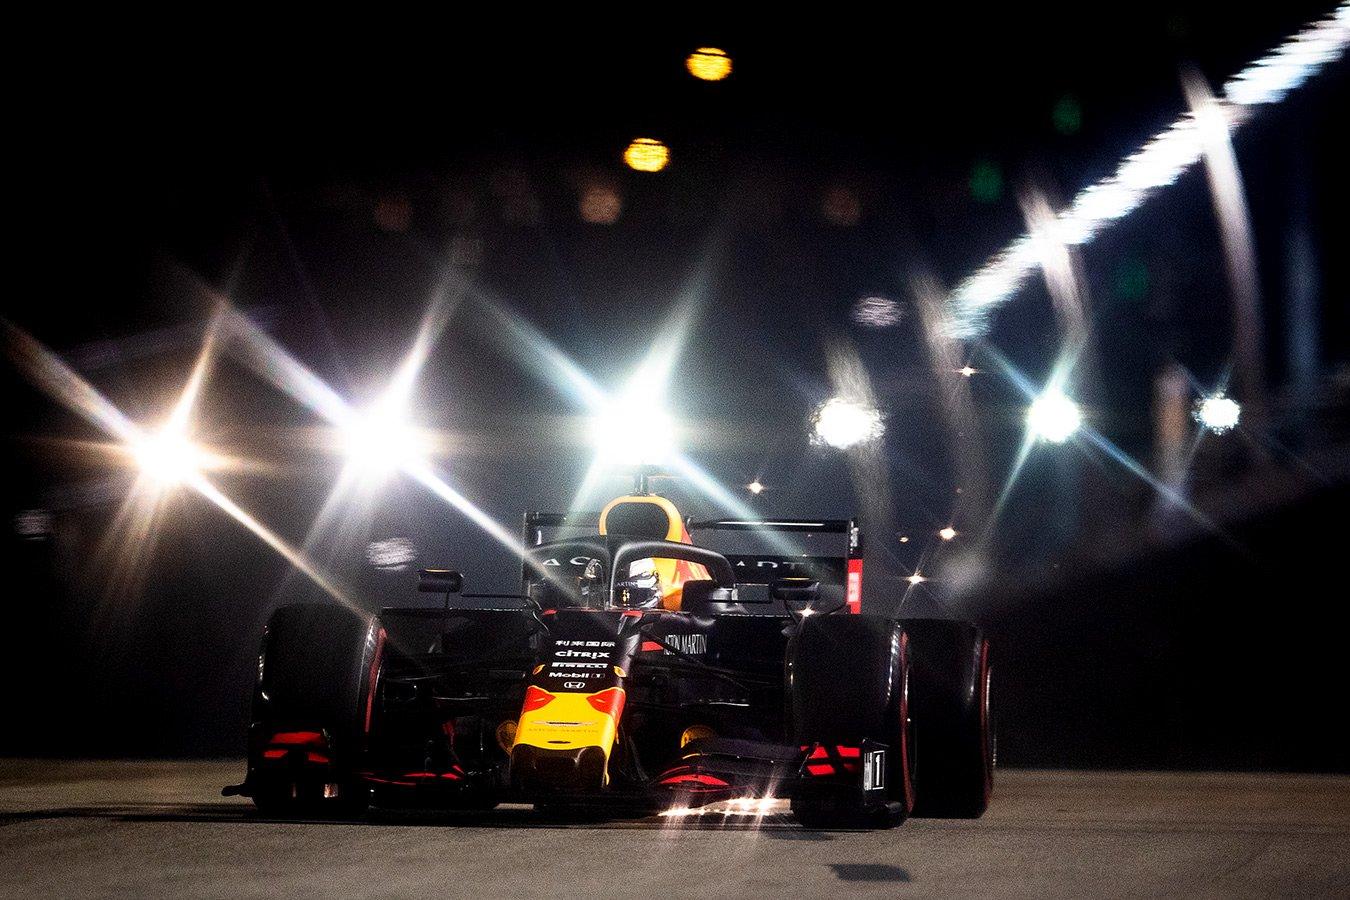 Гран-при Сингапура Формулы-1 отменён